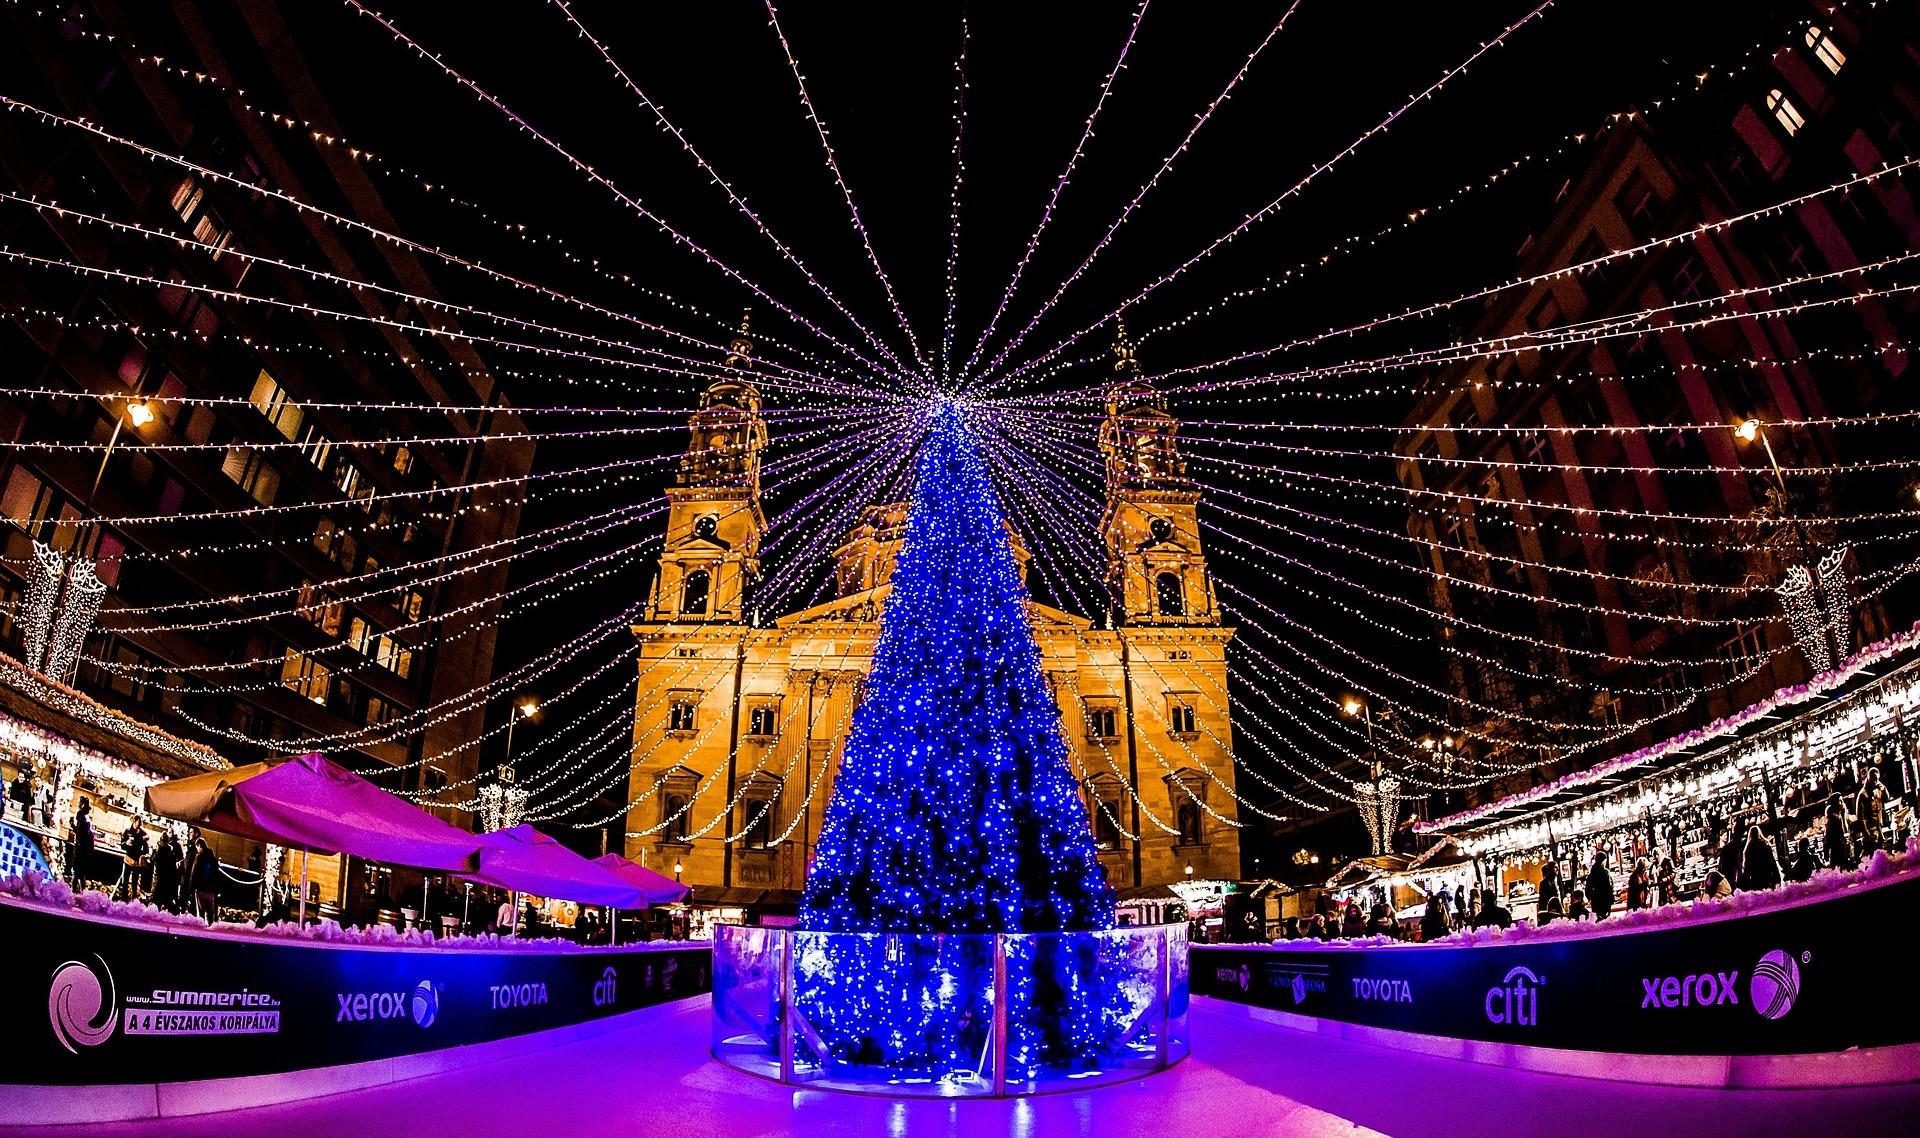 Kerstmarkt Boedapest